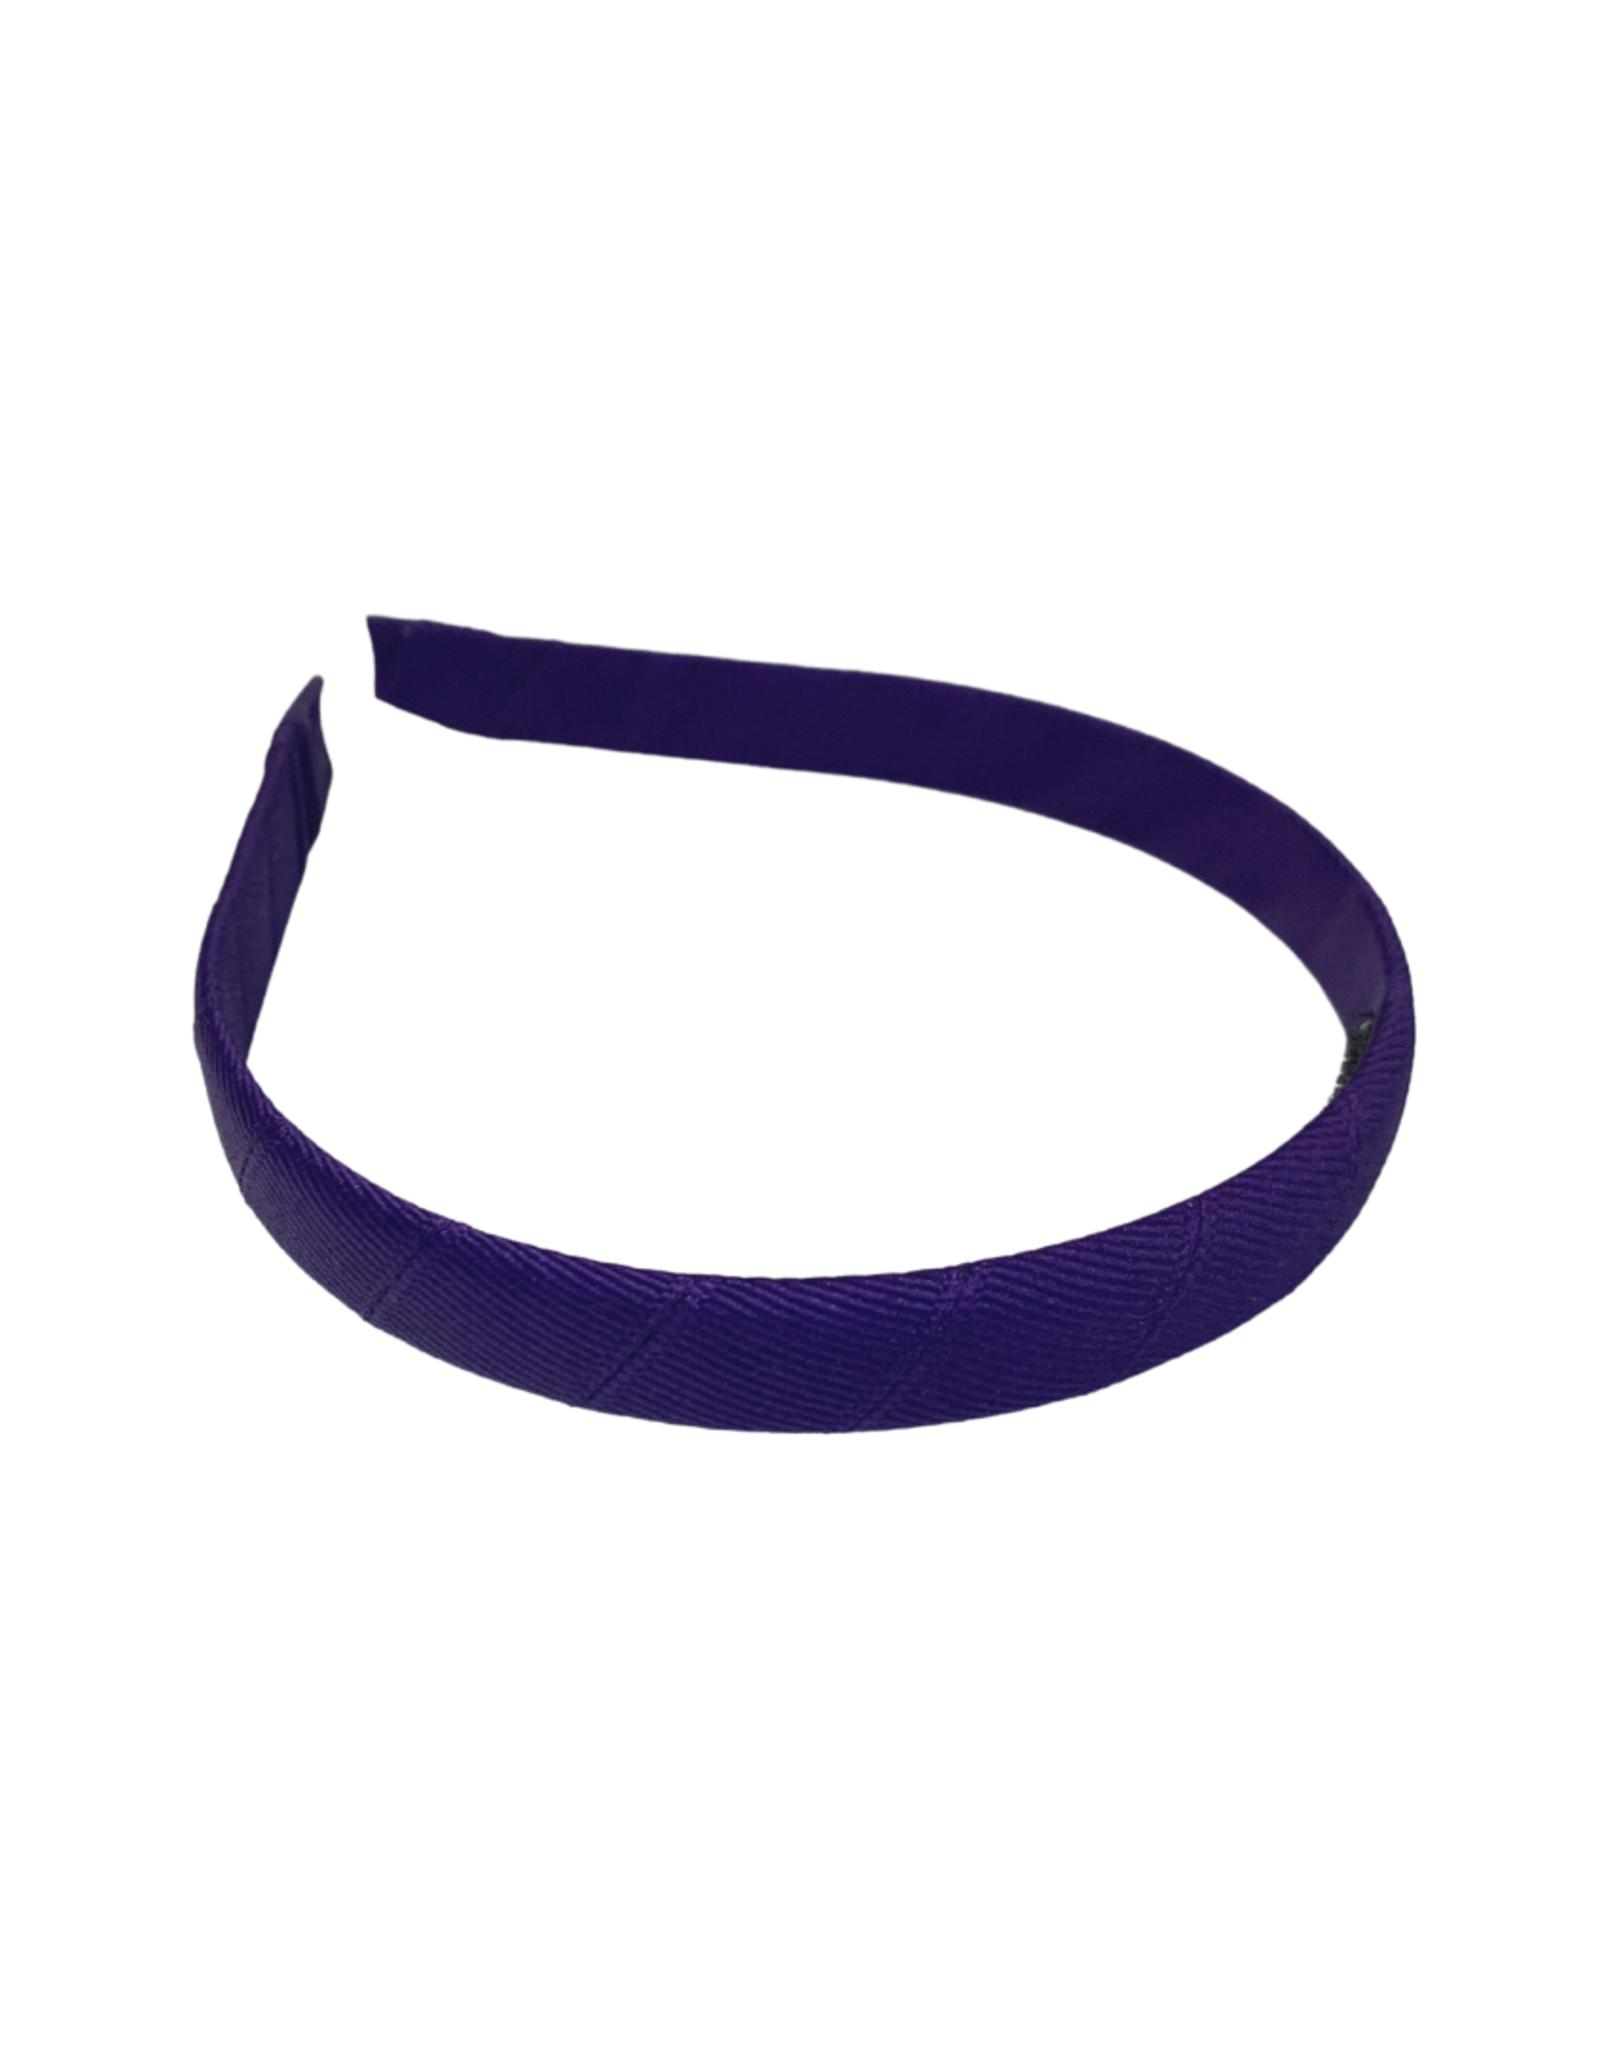 "Bows Arts Headband 1/2"" - Regal Purple"